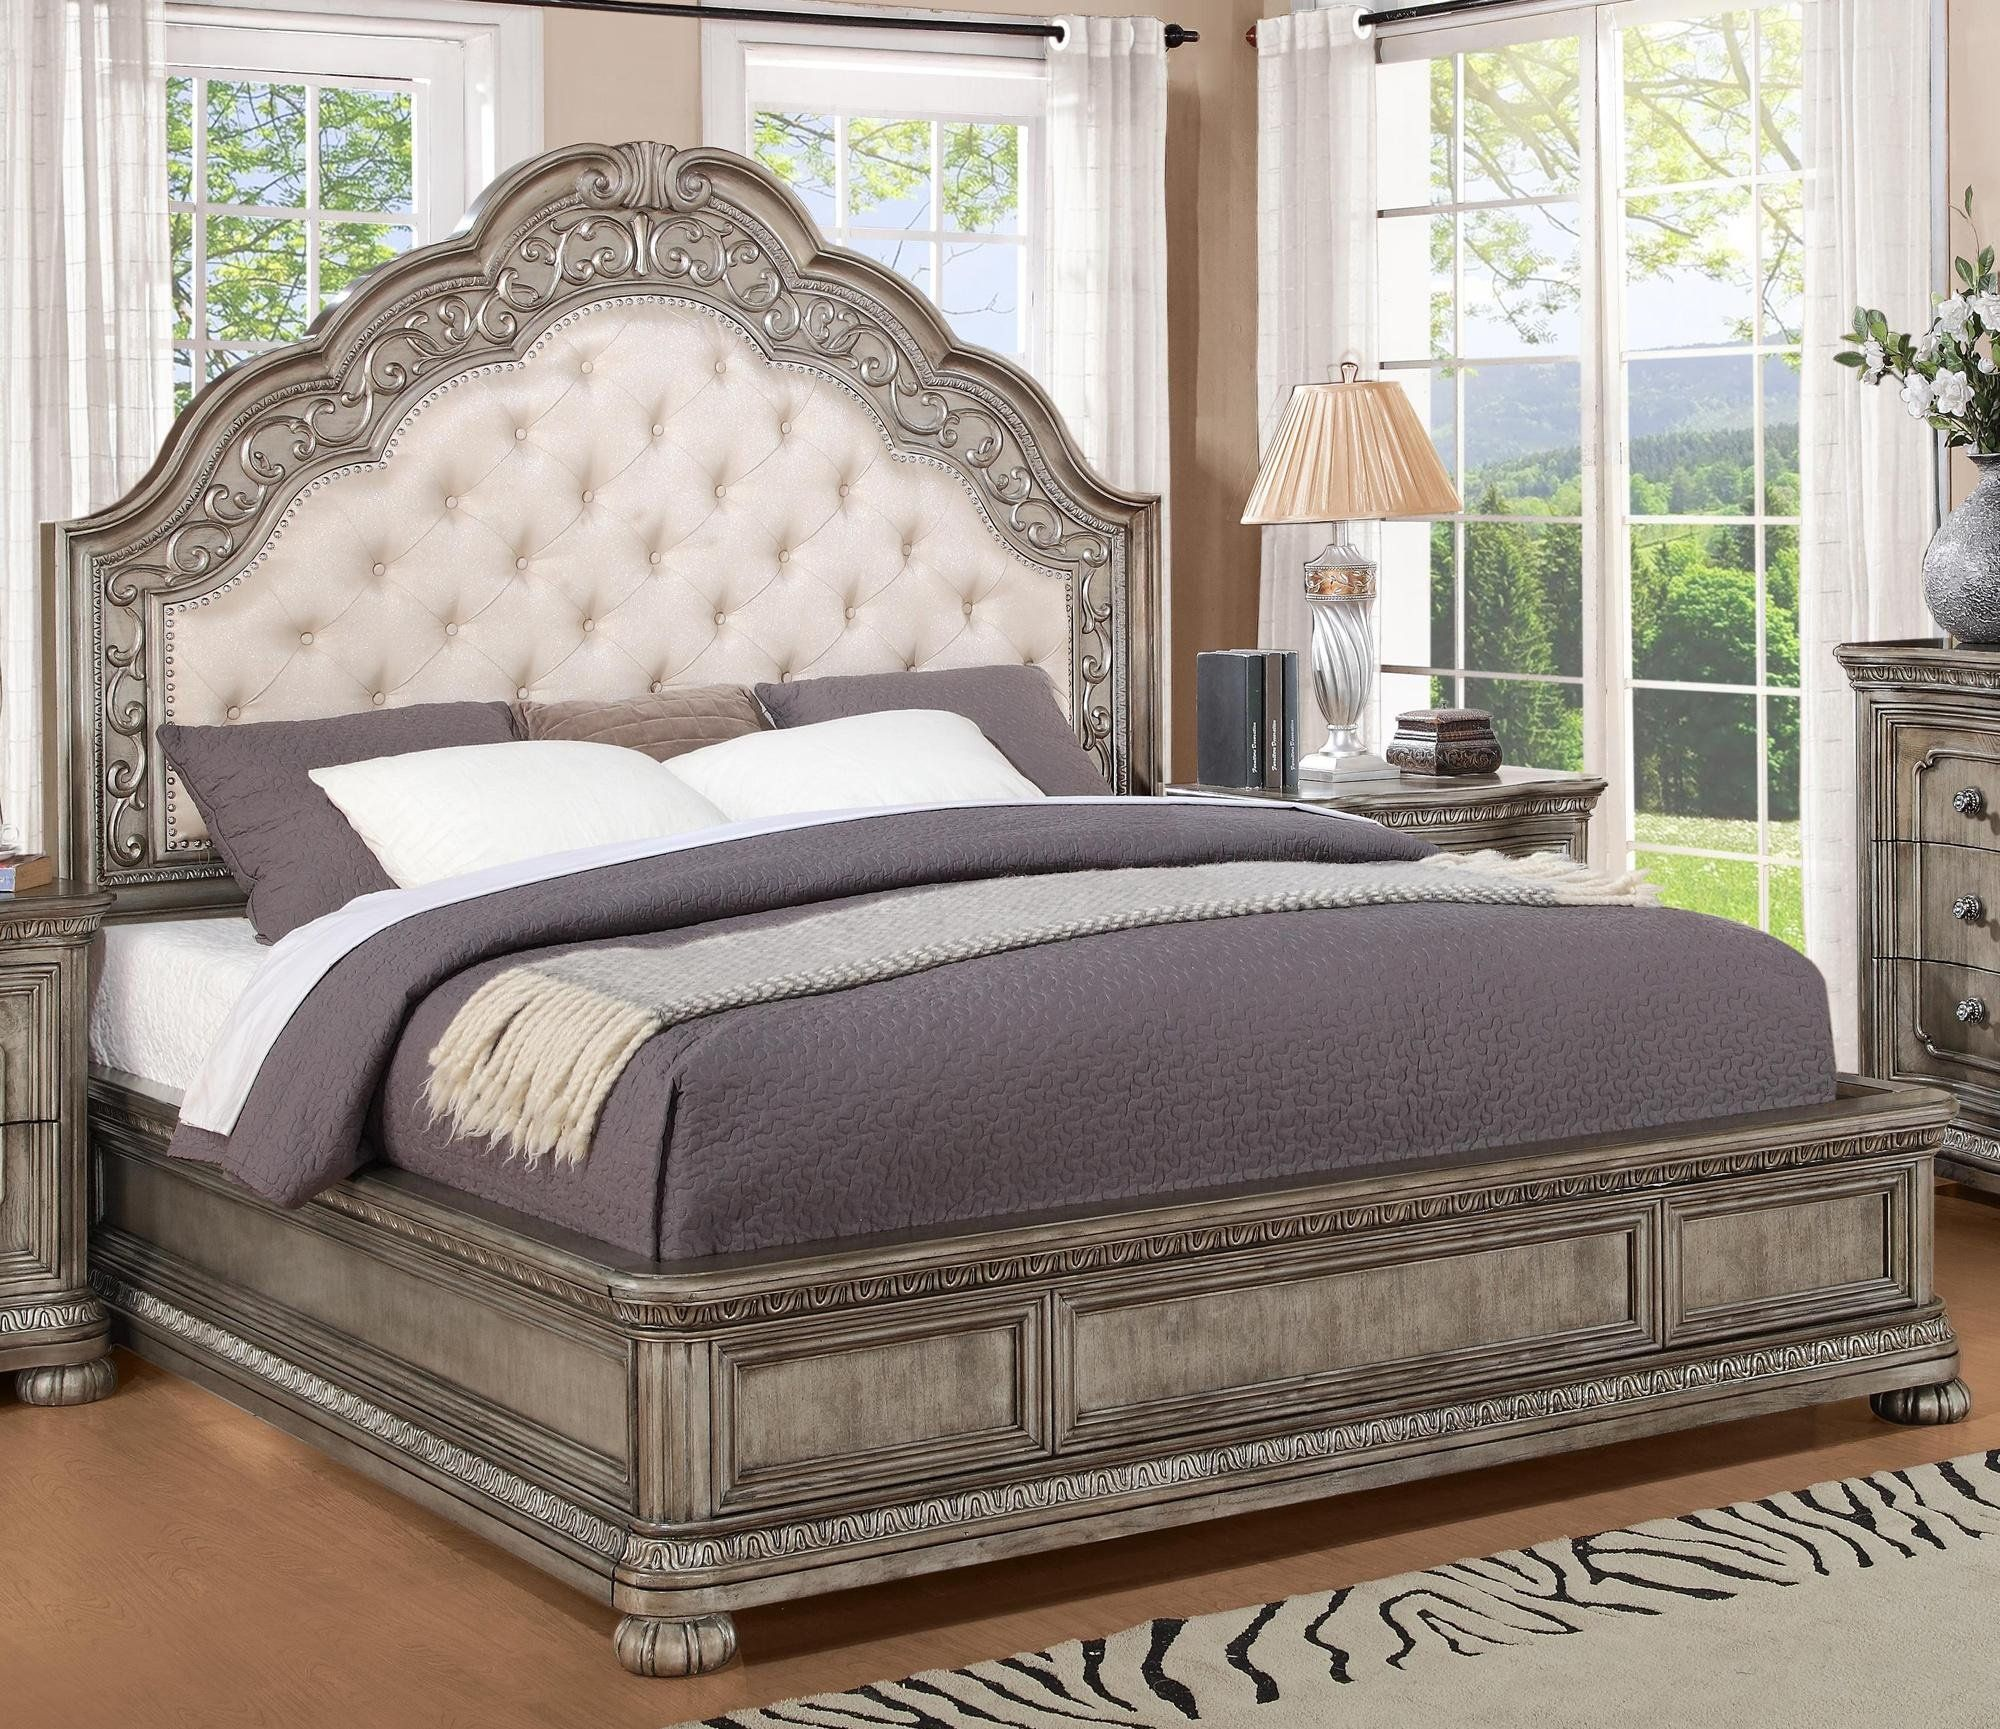 Antique Metallic Traditional King Bed San Cristobal RC